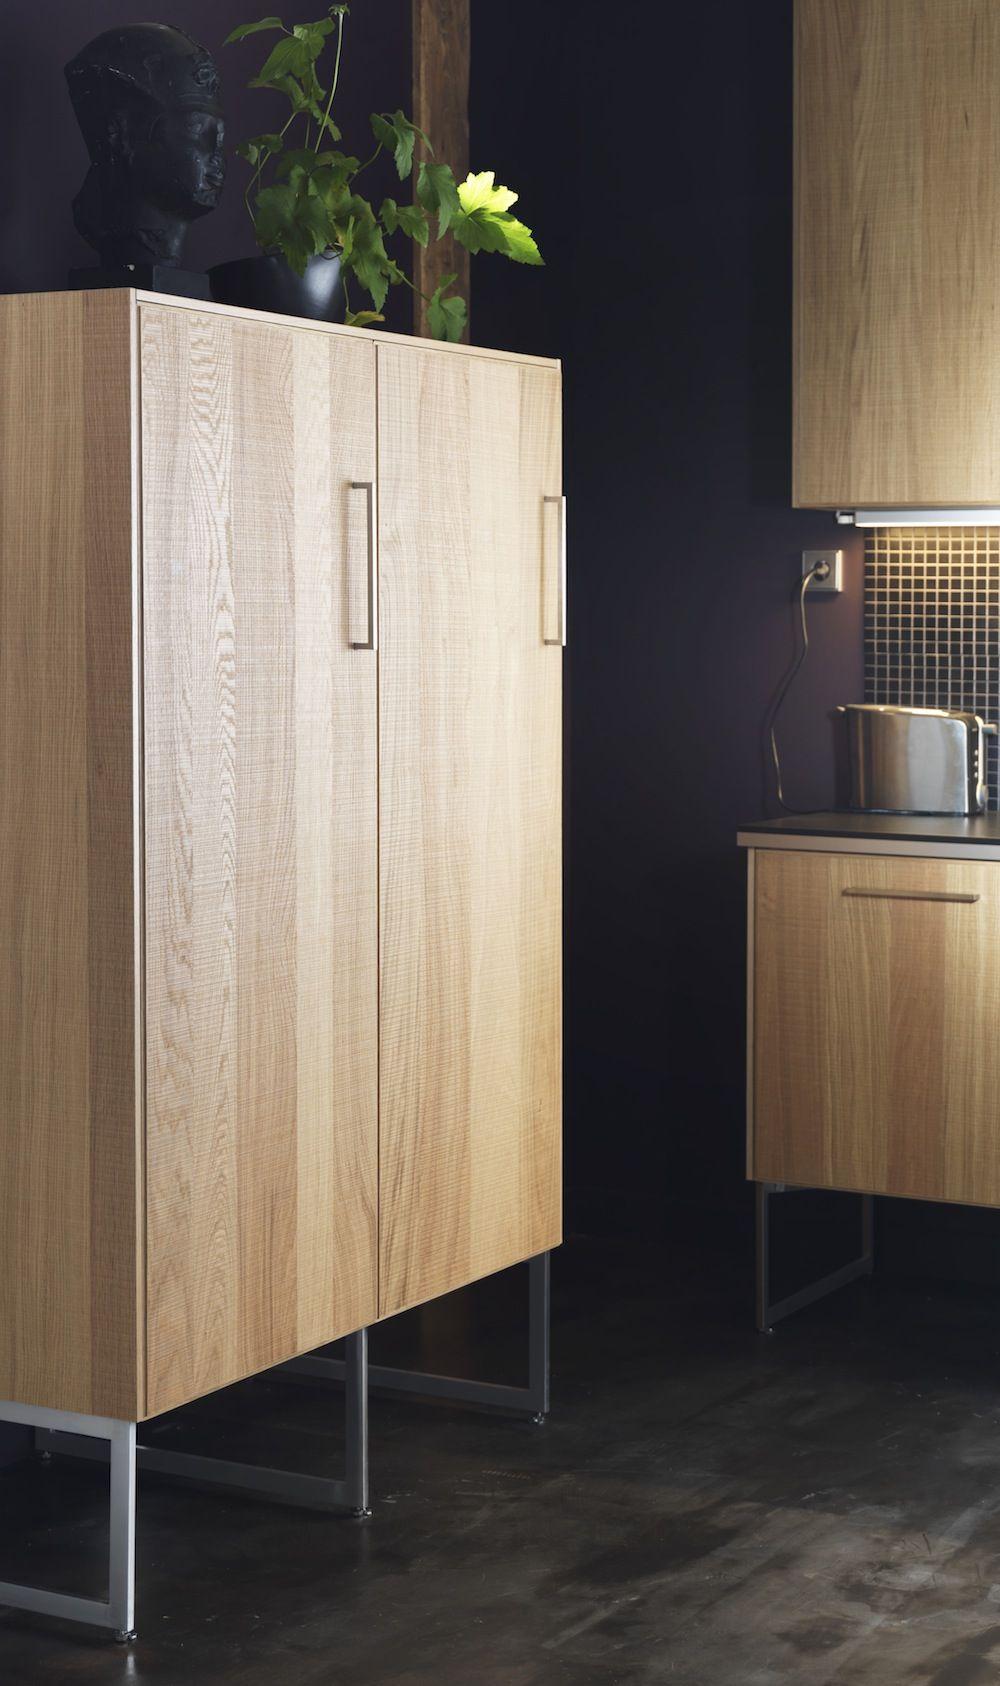 ikea metod hyttan 7 pe389617 ikea k chen pinterest. Black Bedroom Furniture Sets. Home Design Ideas